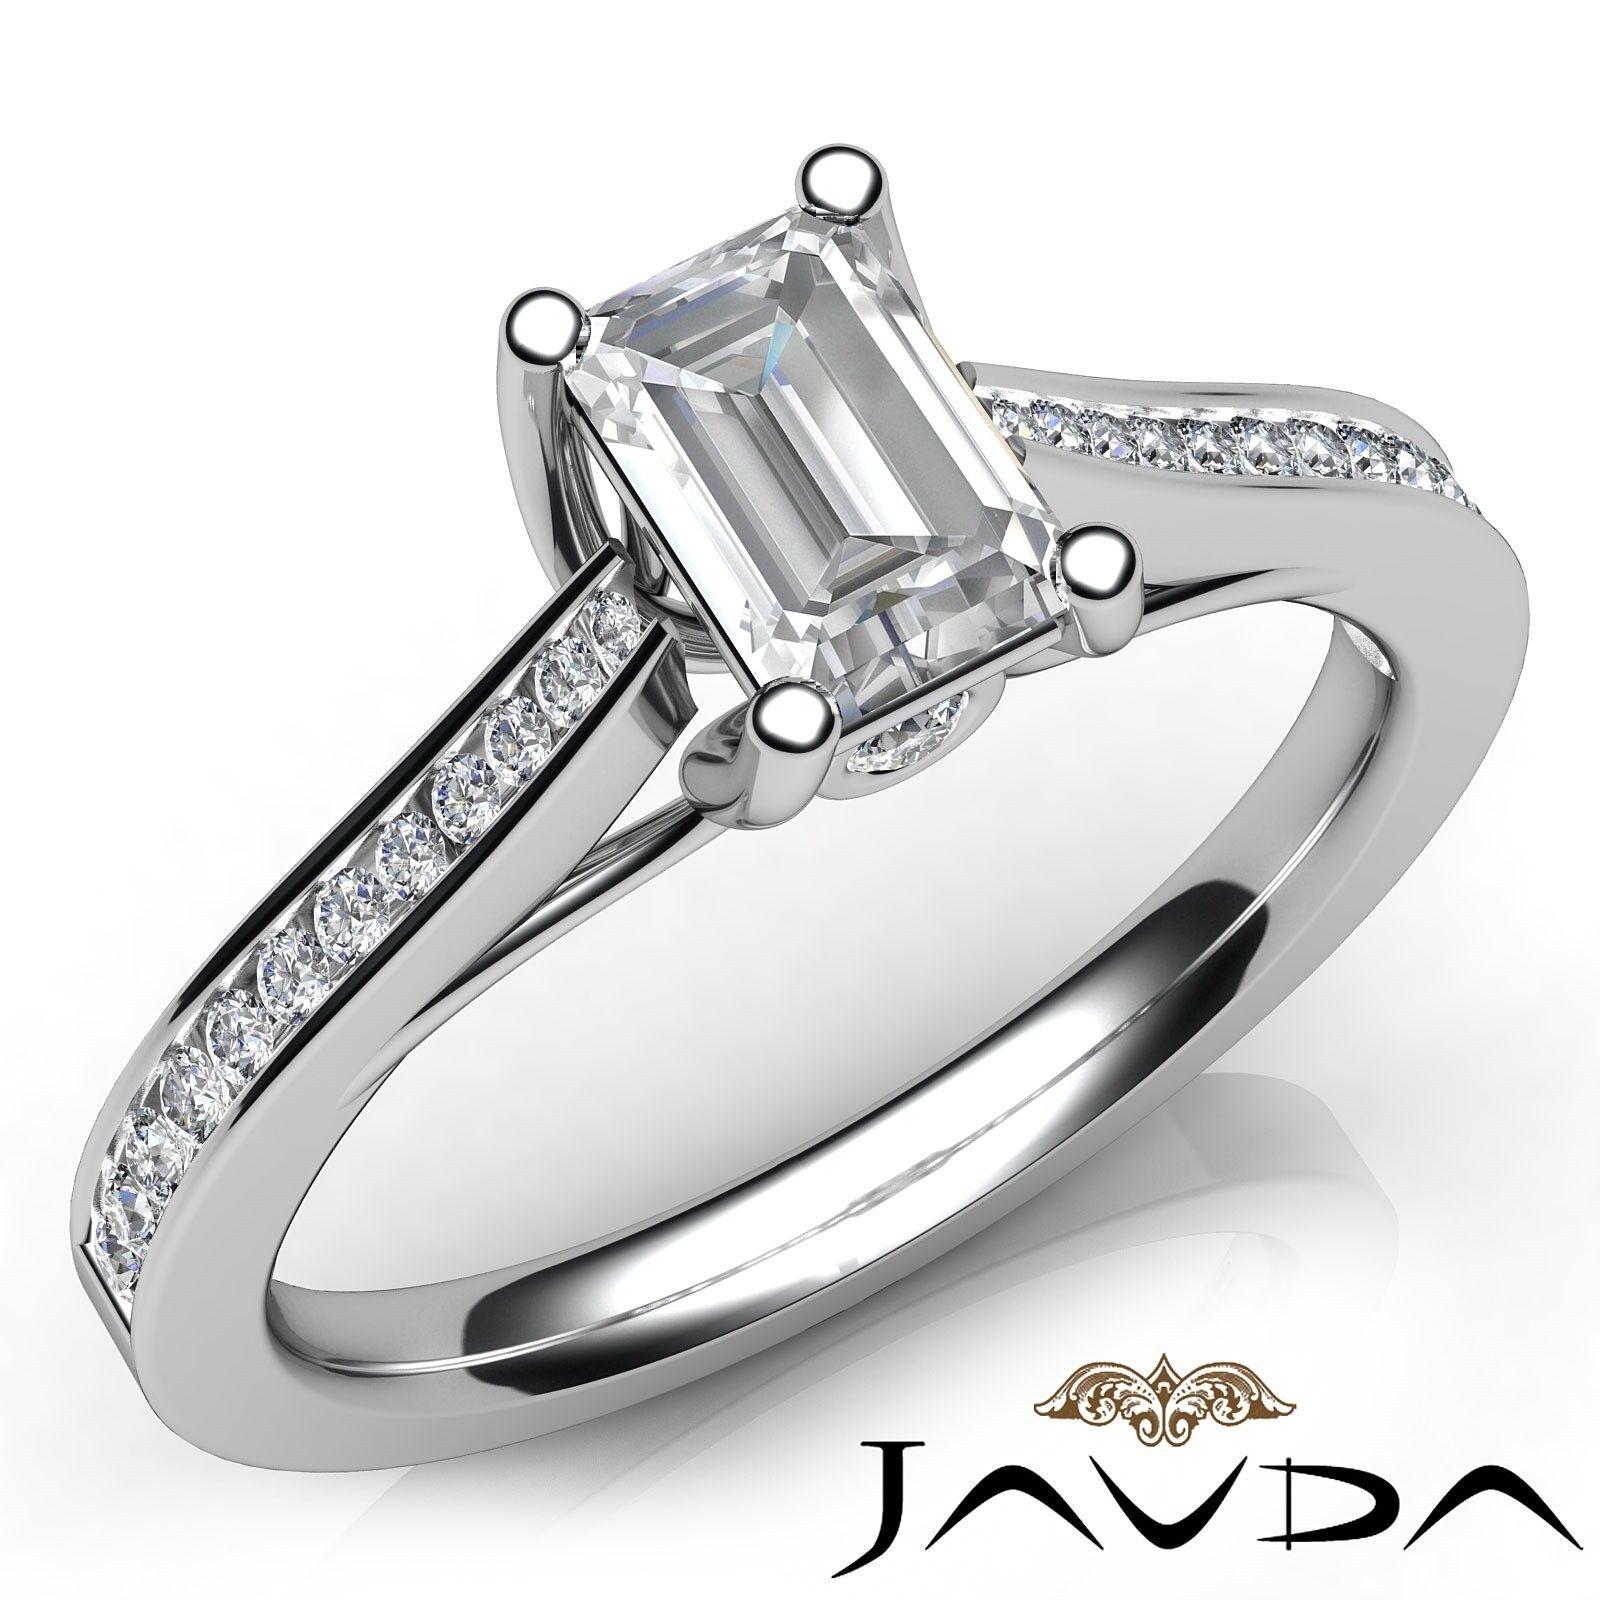 0.71ctw Channel Set Shank Emerald Diamond Engagement Ring GIA E-VVS1 White Gold